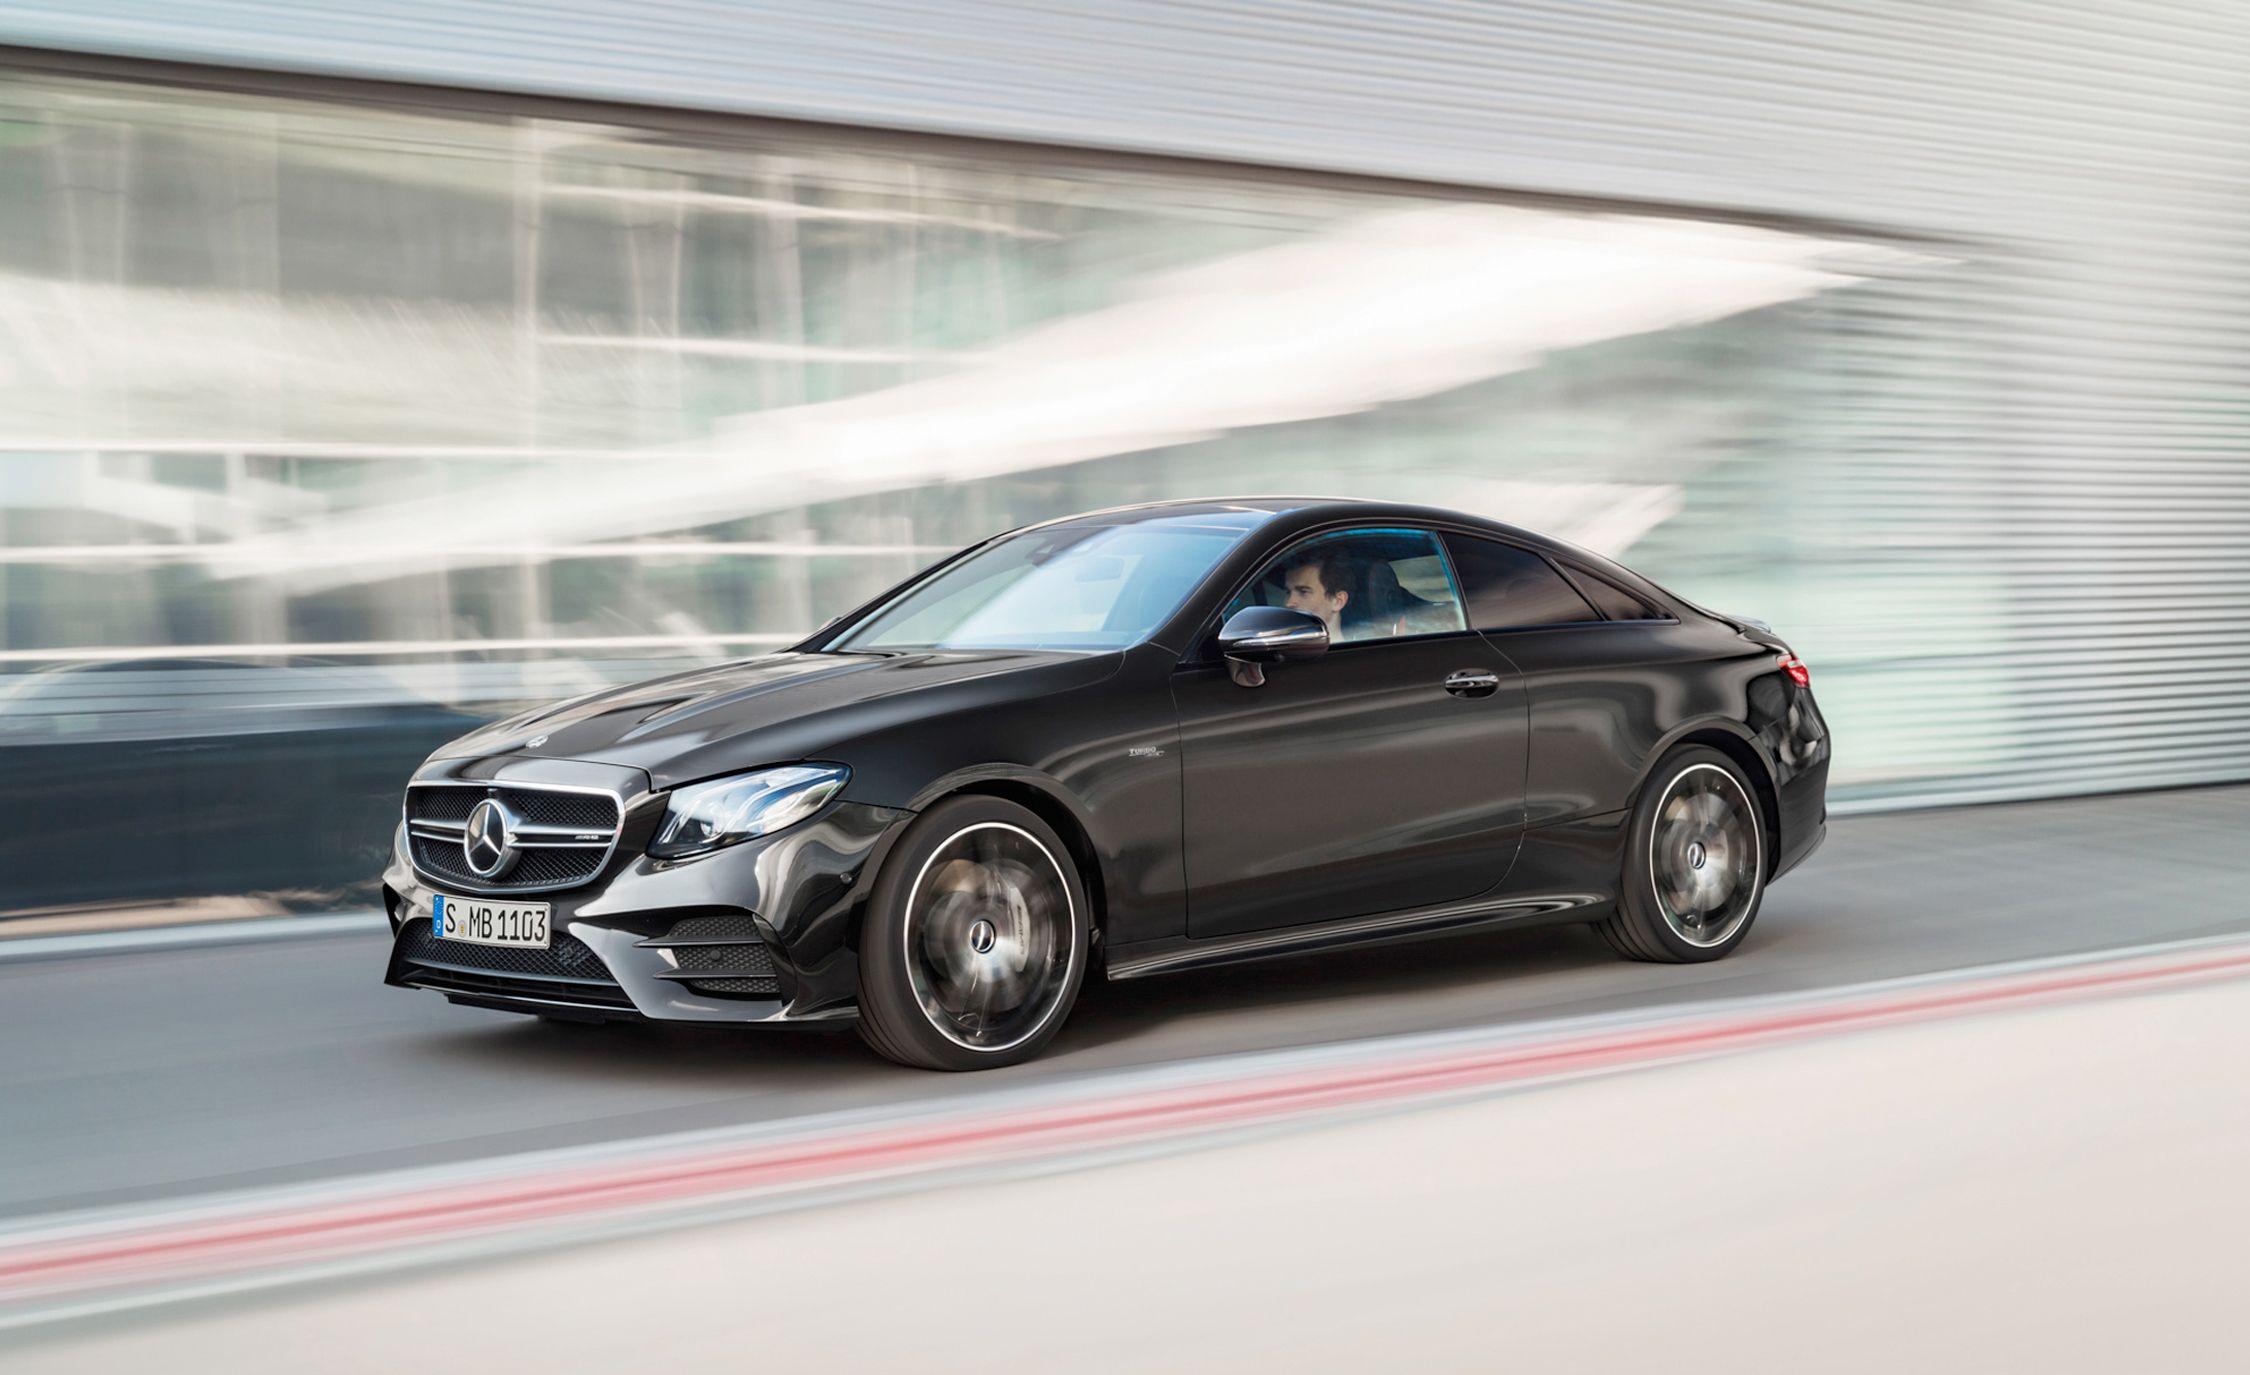 Mercedes-AMG E53 Reviews | Mercedes-AMG E53 Price, Photos, and Specs | Car  and Driver